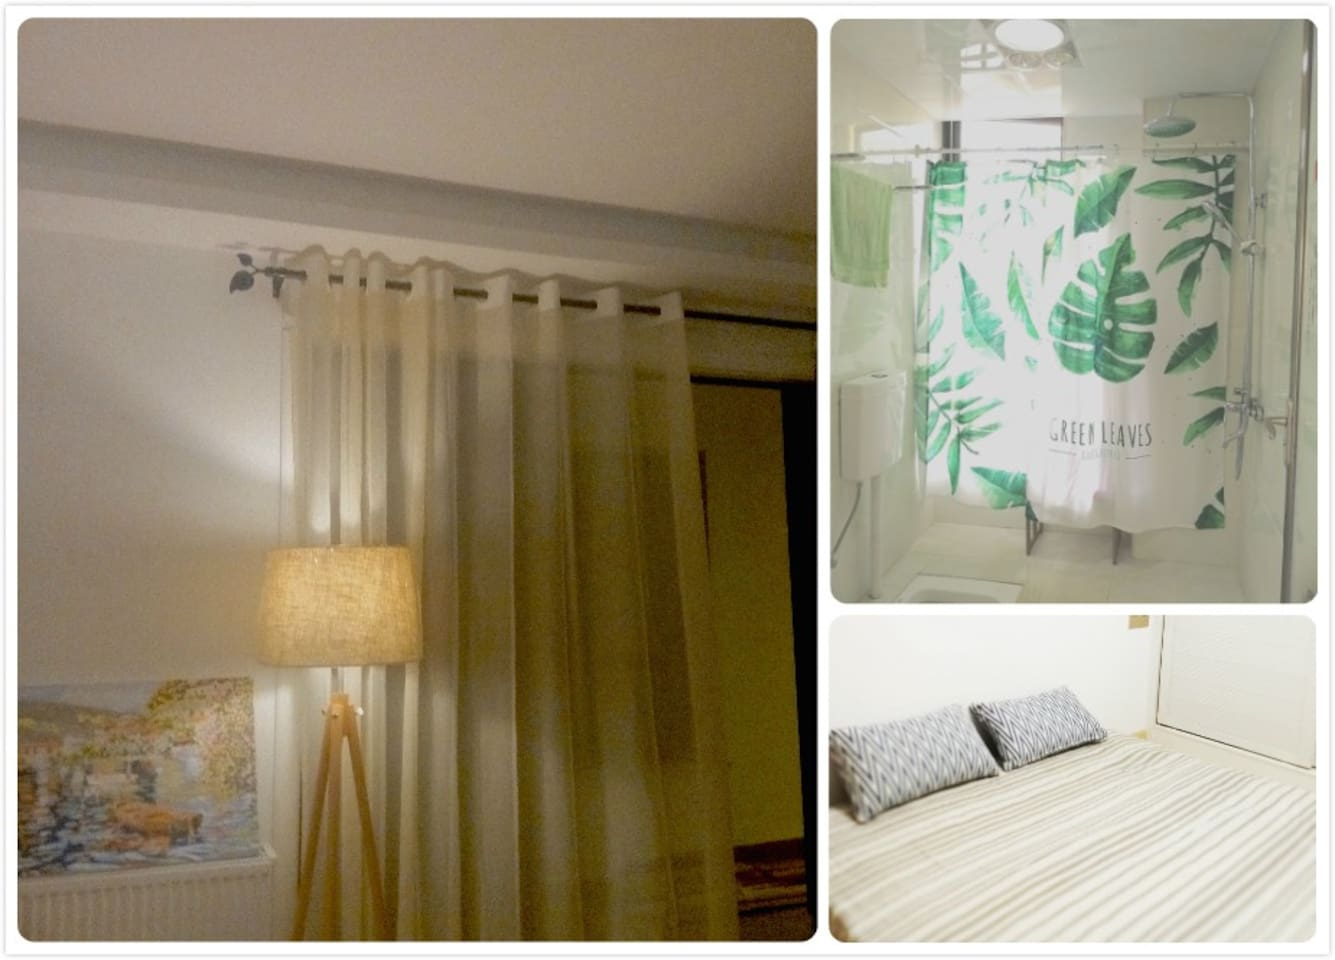 一手房东自住精装新房,简约精致,分享我的生活你的故事: Fine decorated brand new apartment:be my guest and tell your story !